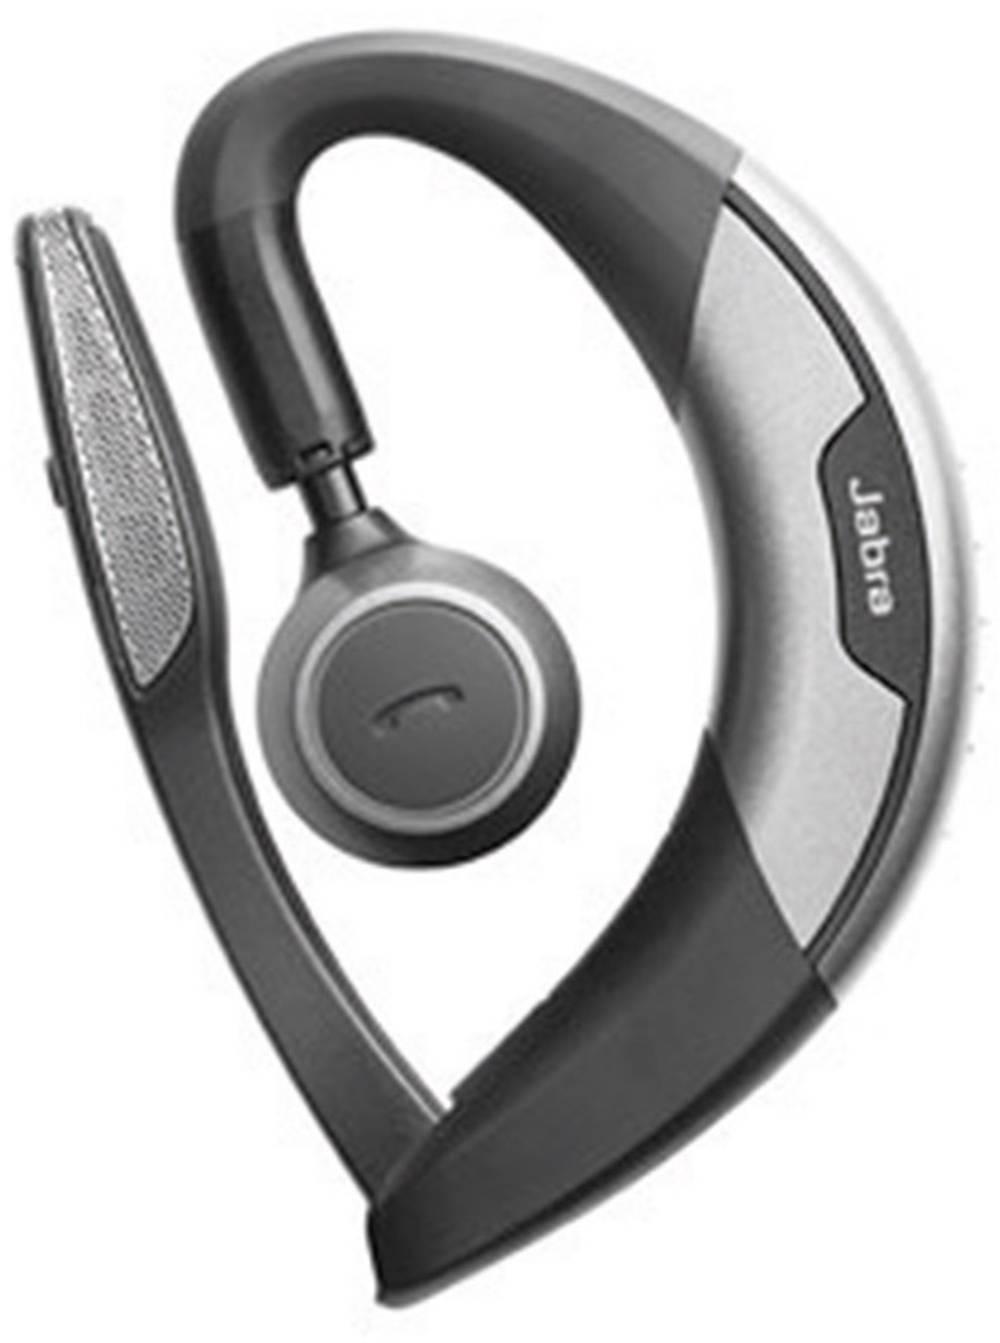 Jabra bluetooth headset online shopping